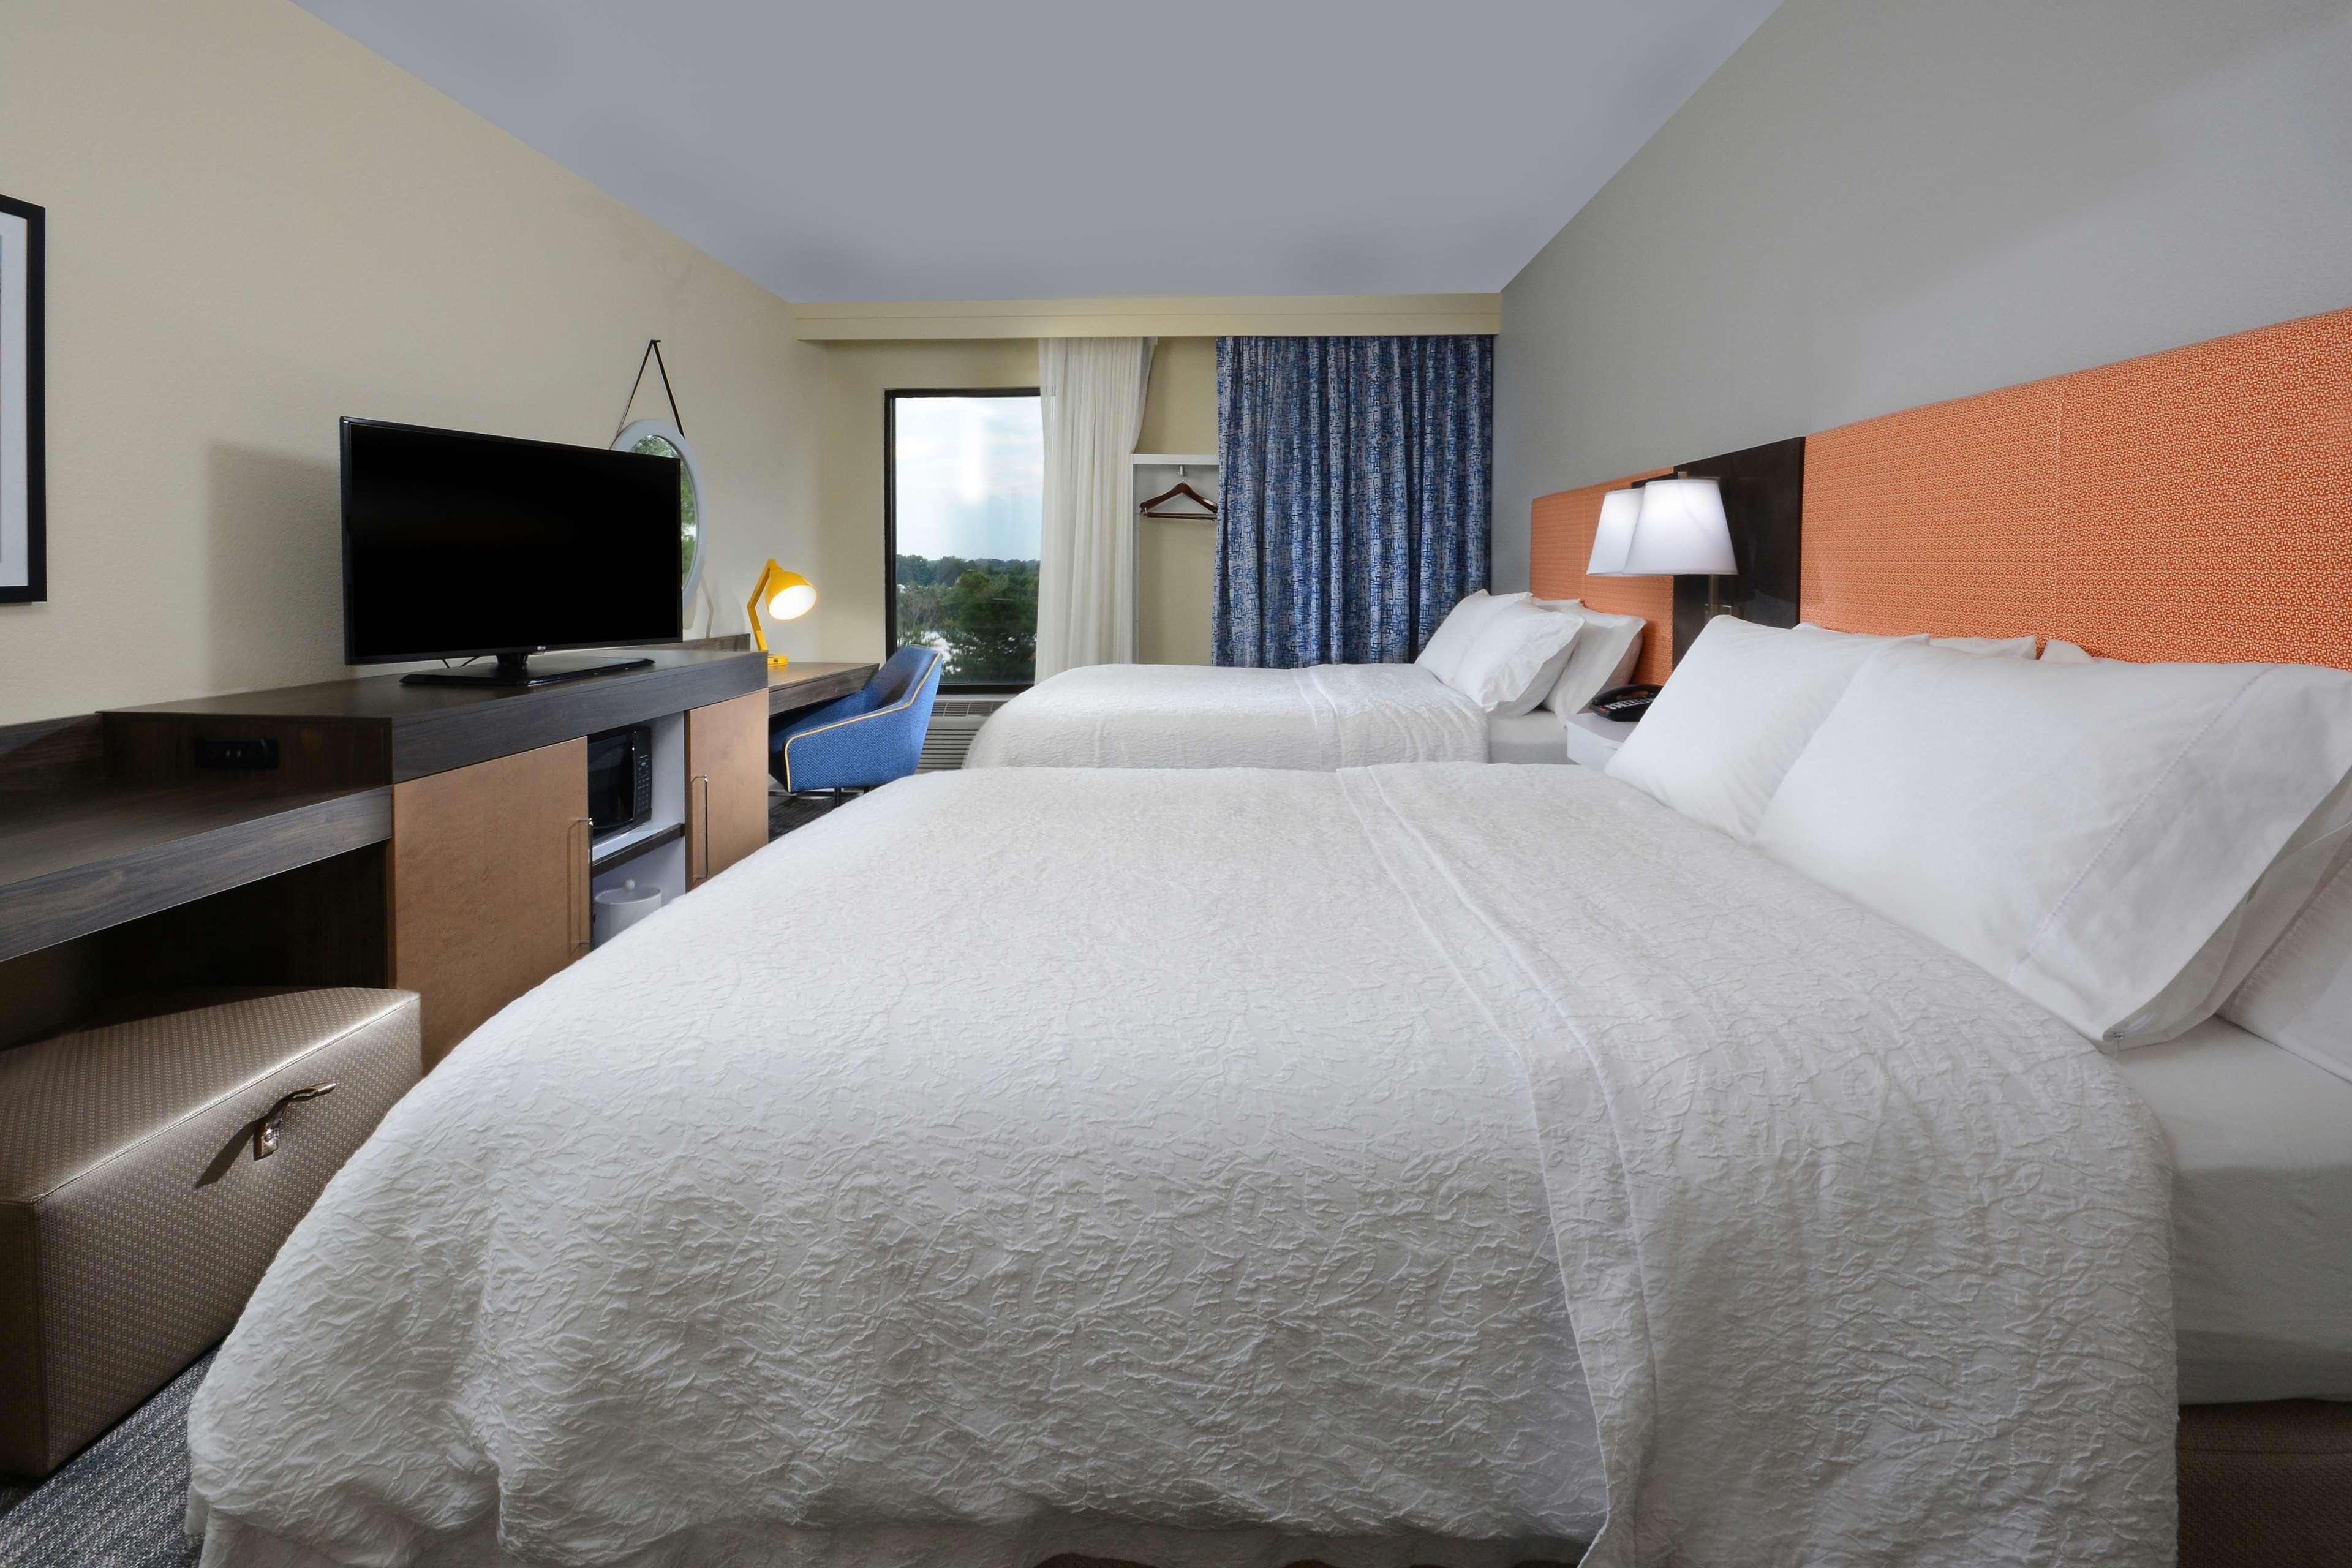 Hampton Inn & Suites Greenville/Spartanburg I-85 image 30